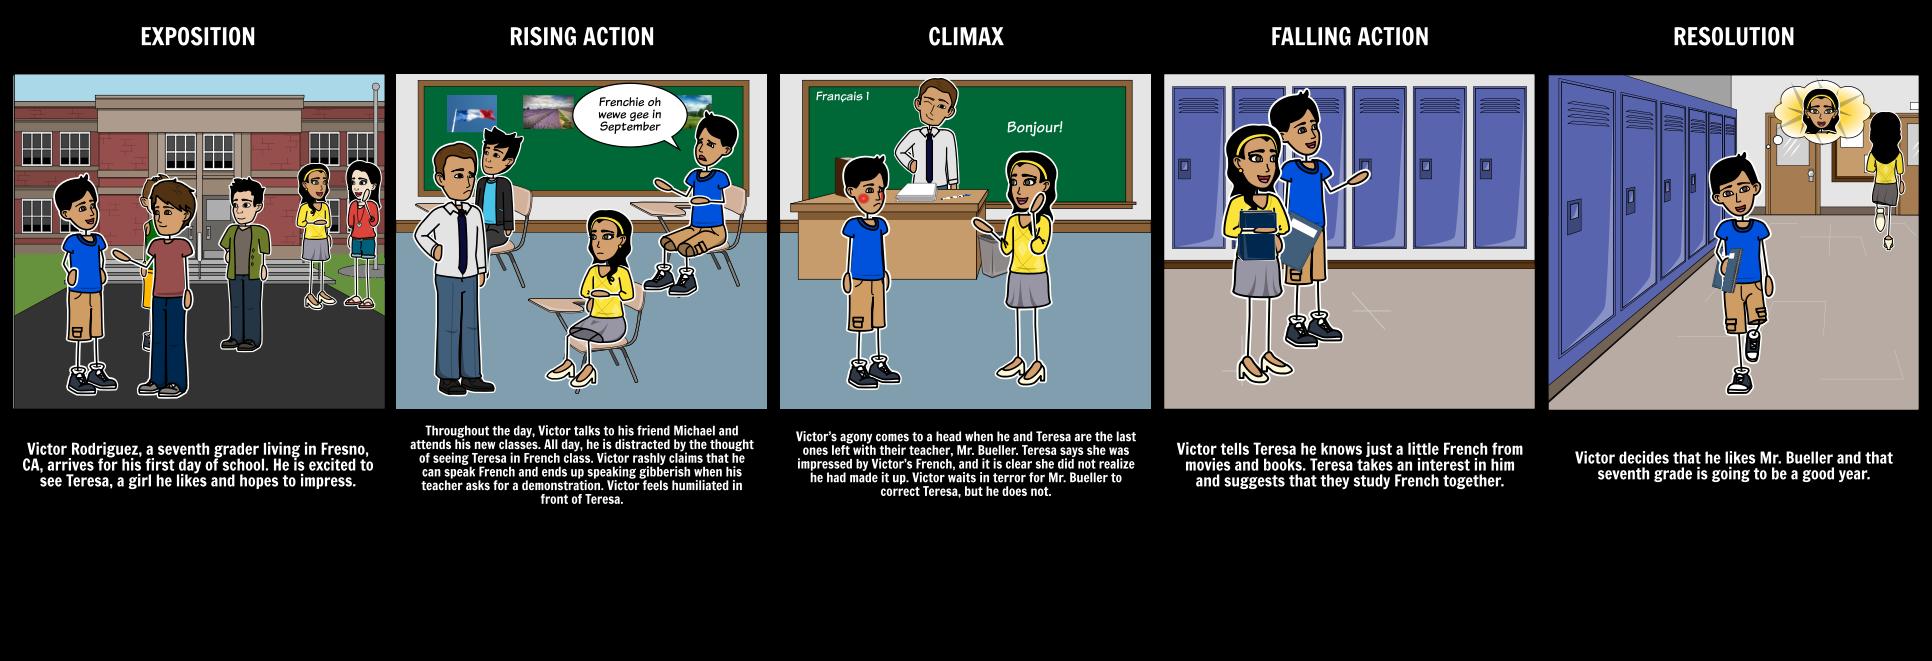 Seventh grade by gary soto short stories middle school 7th grade seventh grade plot diagram publicscrutiny Images